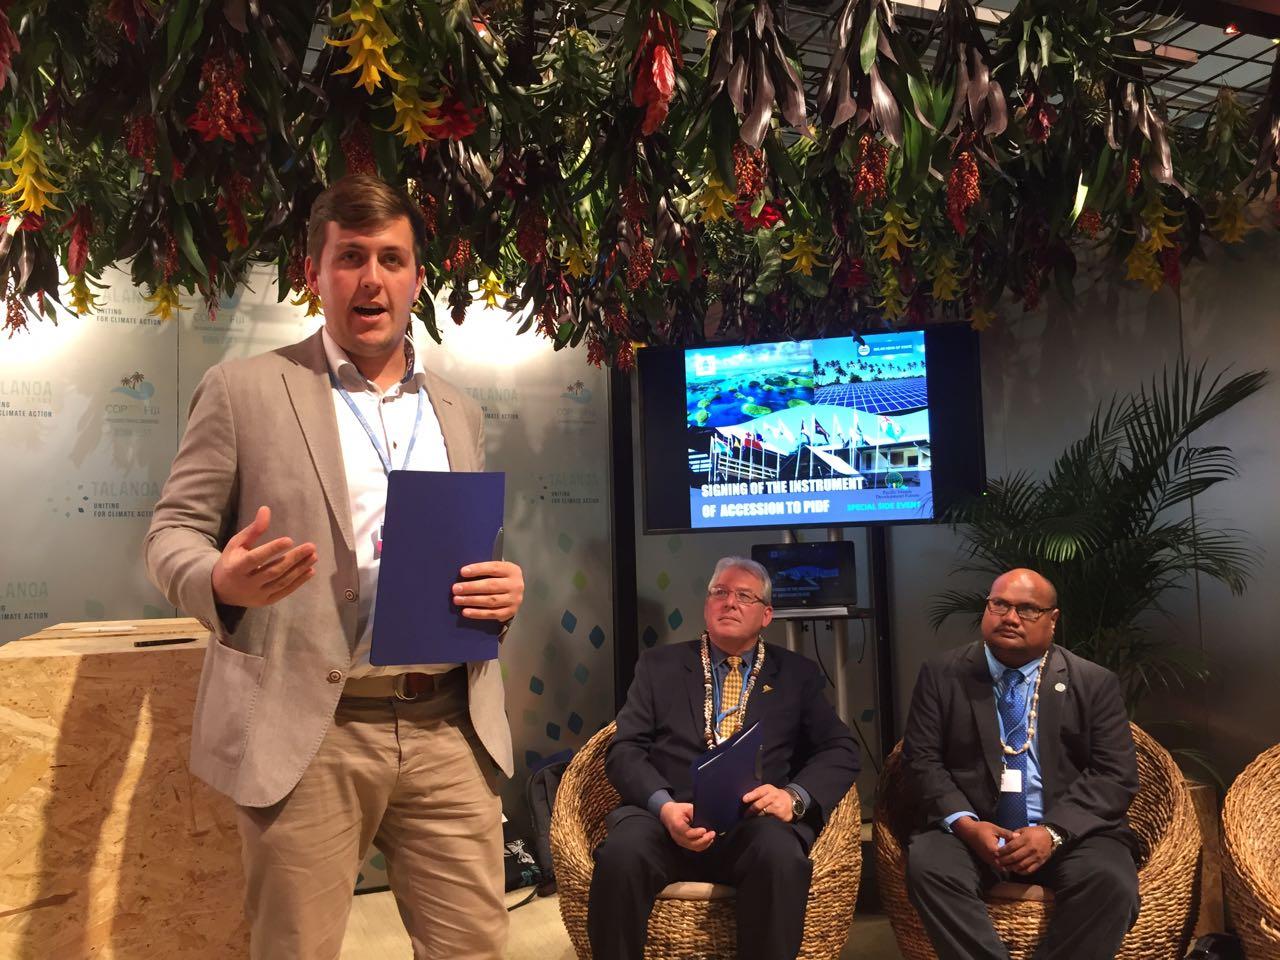 SHOS Director James Ellsmoor presents the model of enagagement with Palau.